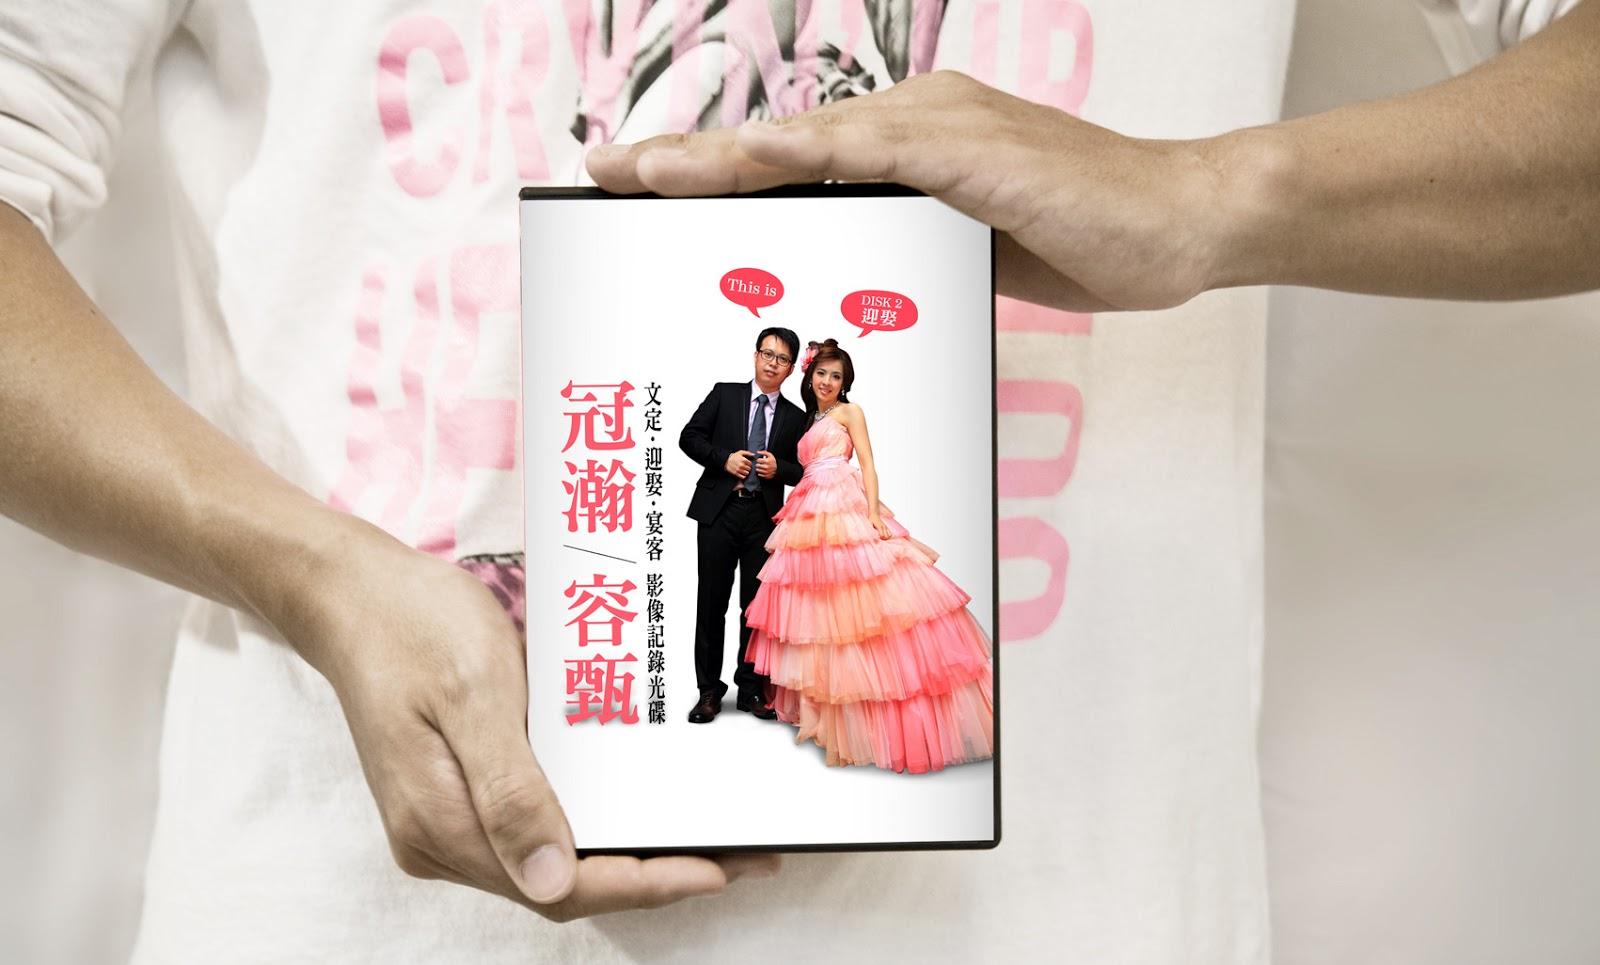 SHOWCASE作品展示 | 冠瀚×容甄婚攝DVD封面設計 by MUMULab.com